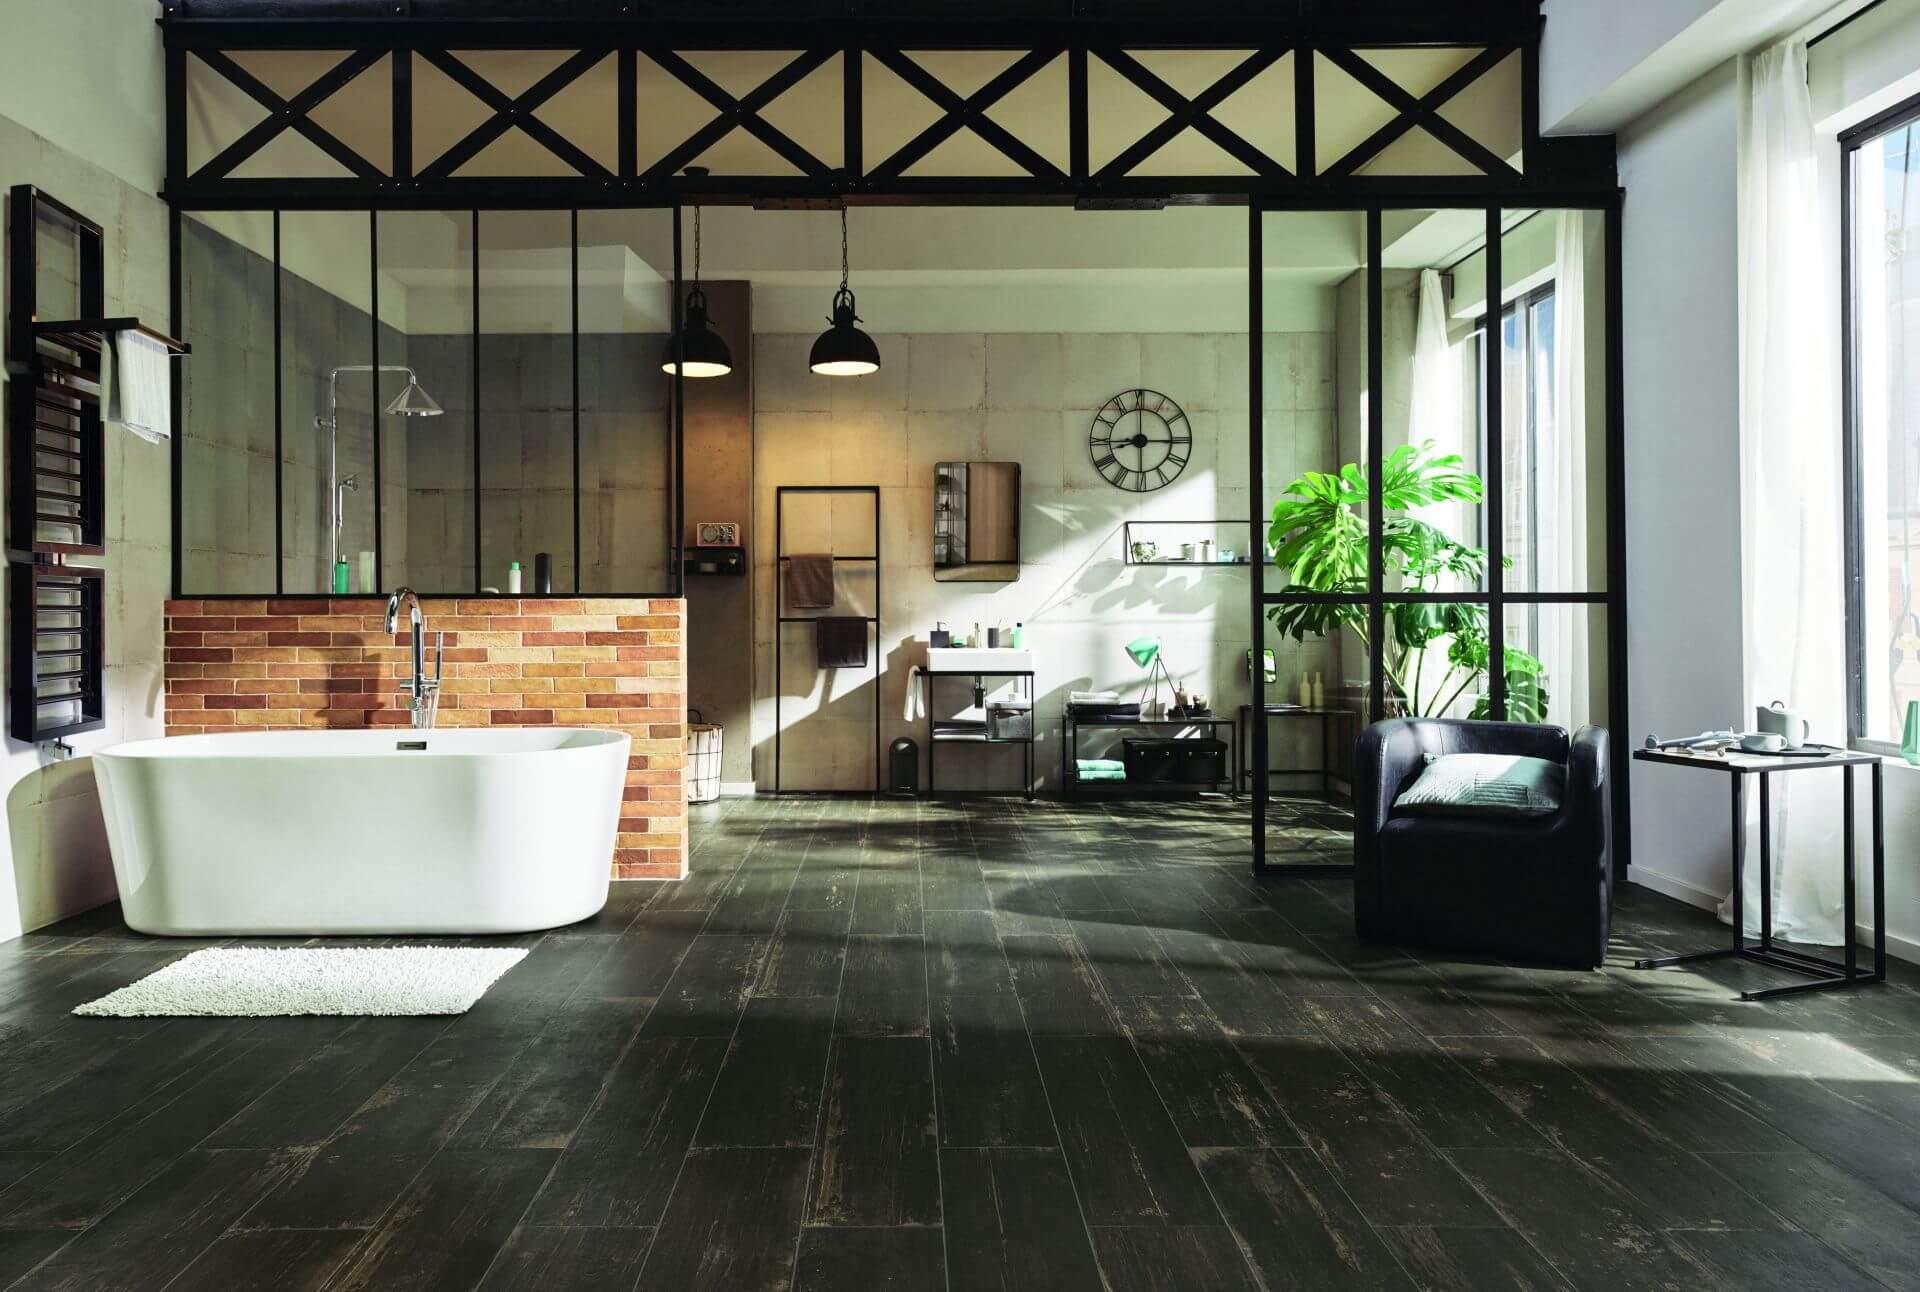 CEDEO - OUR BATHROOMS INSPIRE YOU